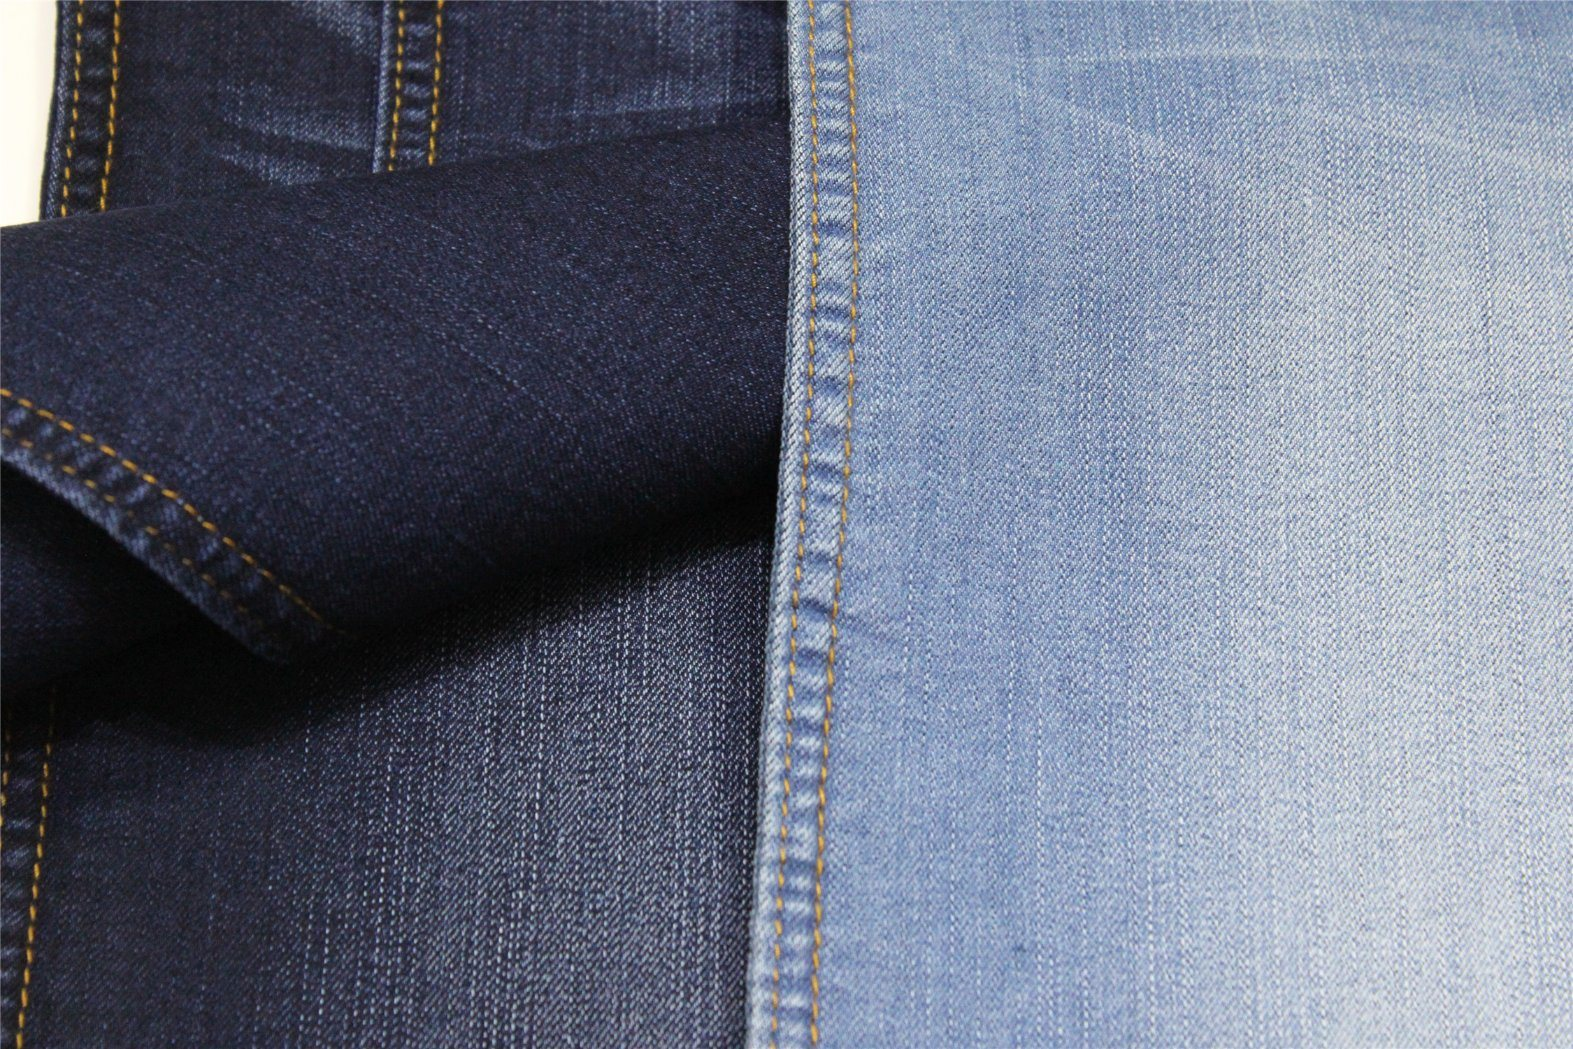 Cotton Polyester Rayon Spandex Indigo Denim